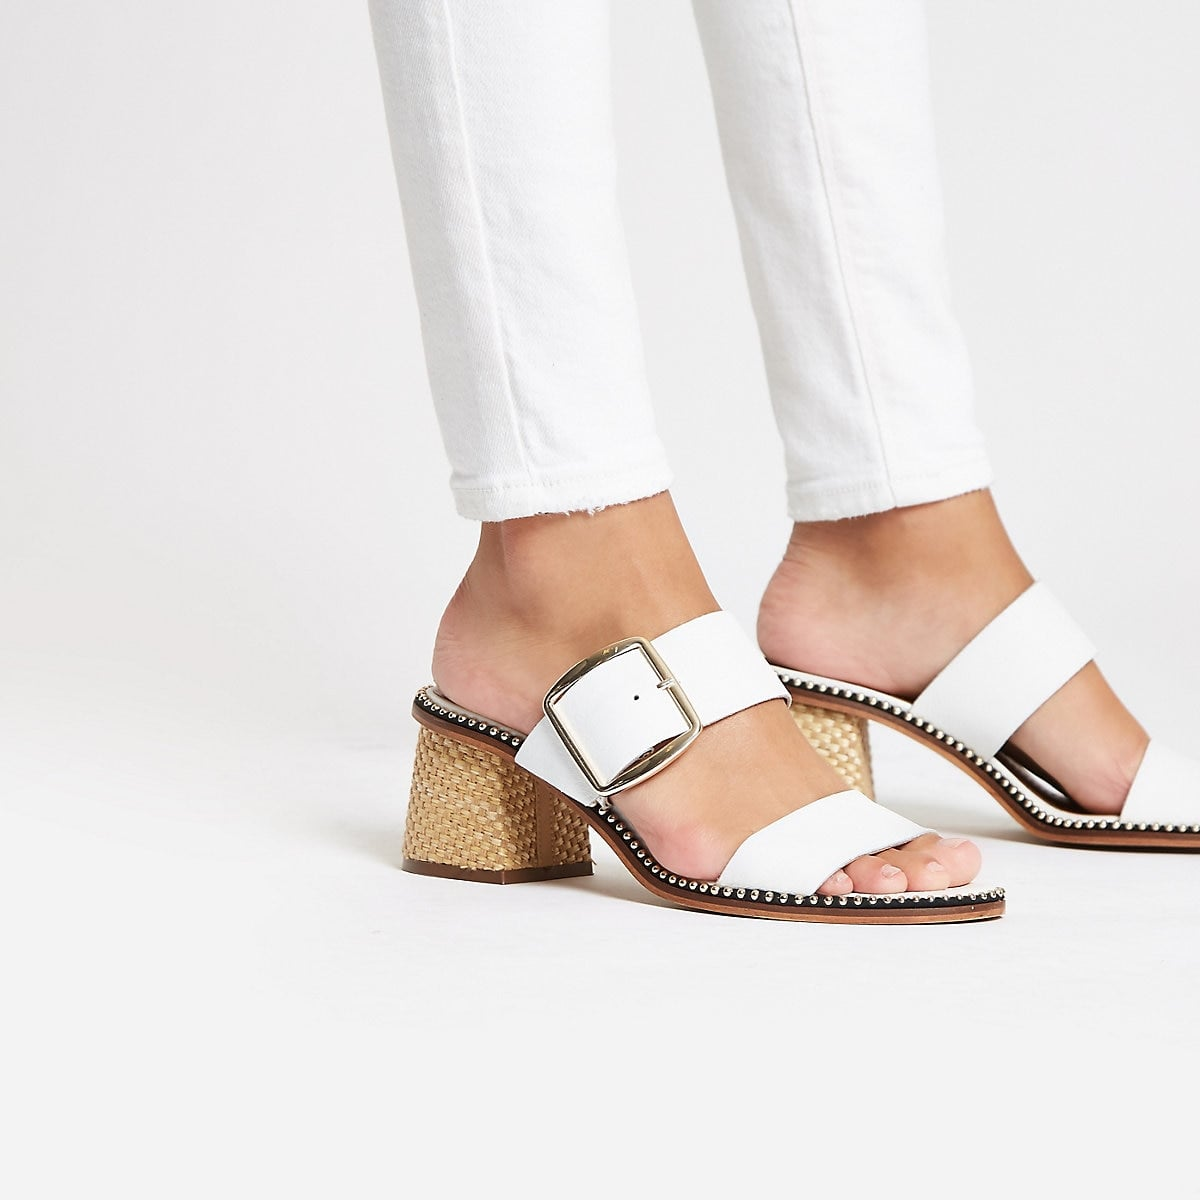 River Island White Leather Block-Heel